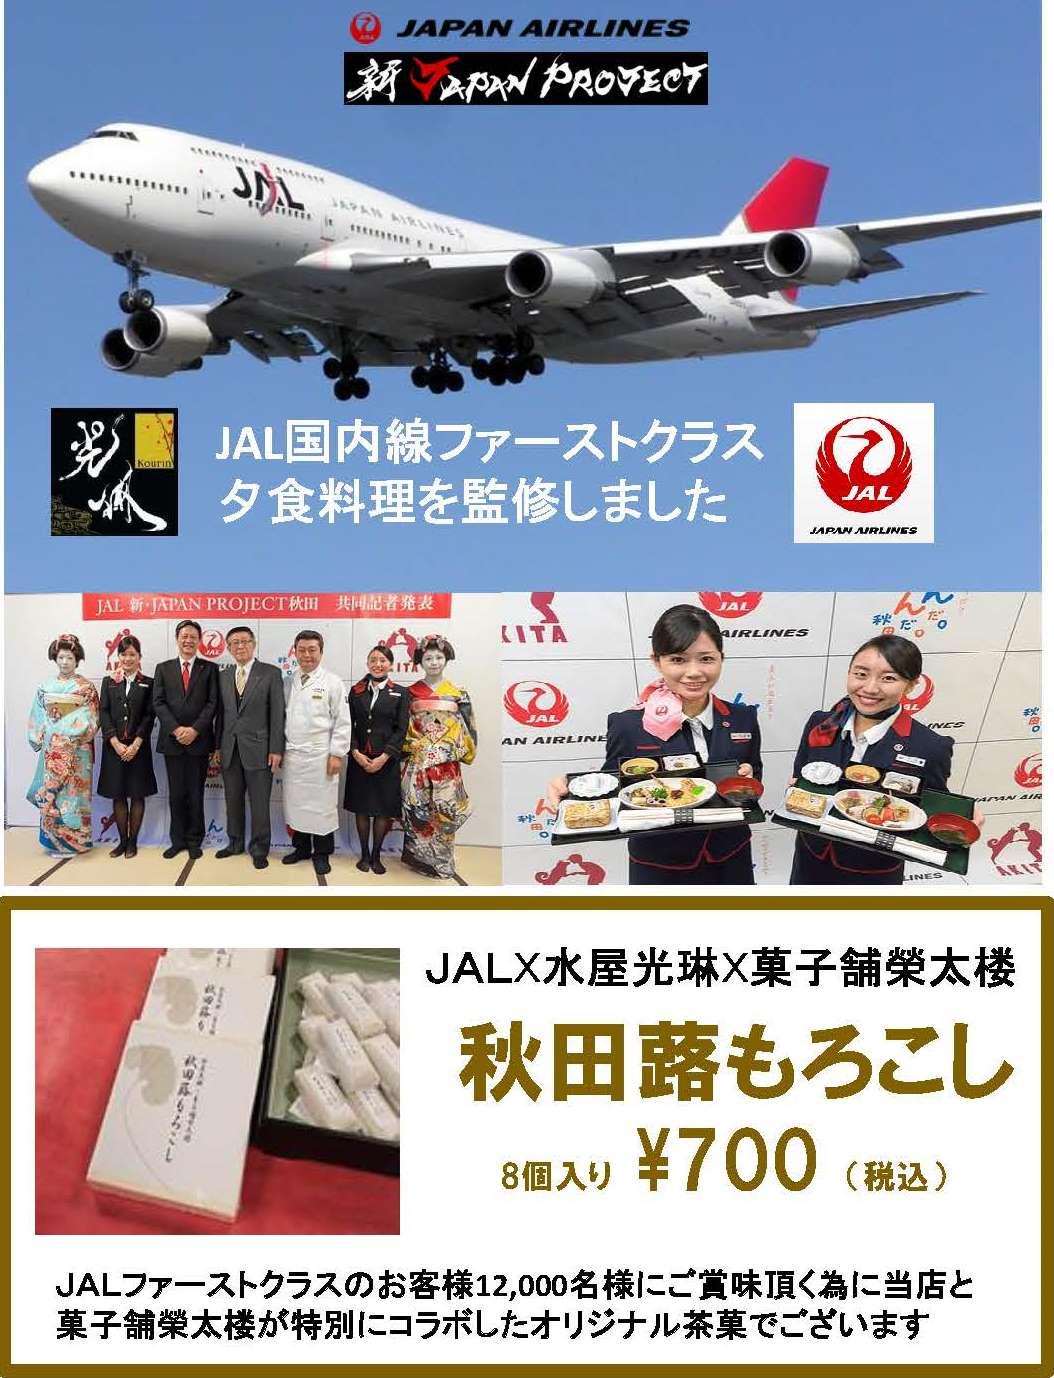 JAL国内線ファーストクラス夕食料理を監修しました